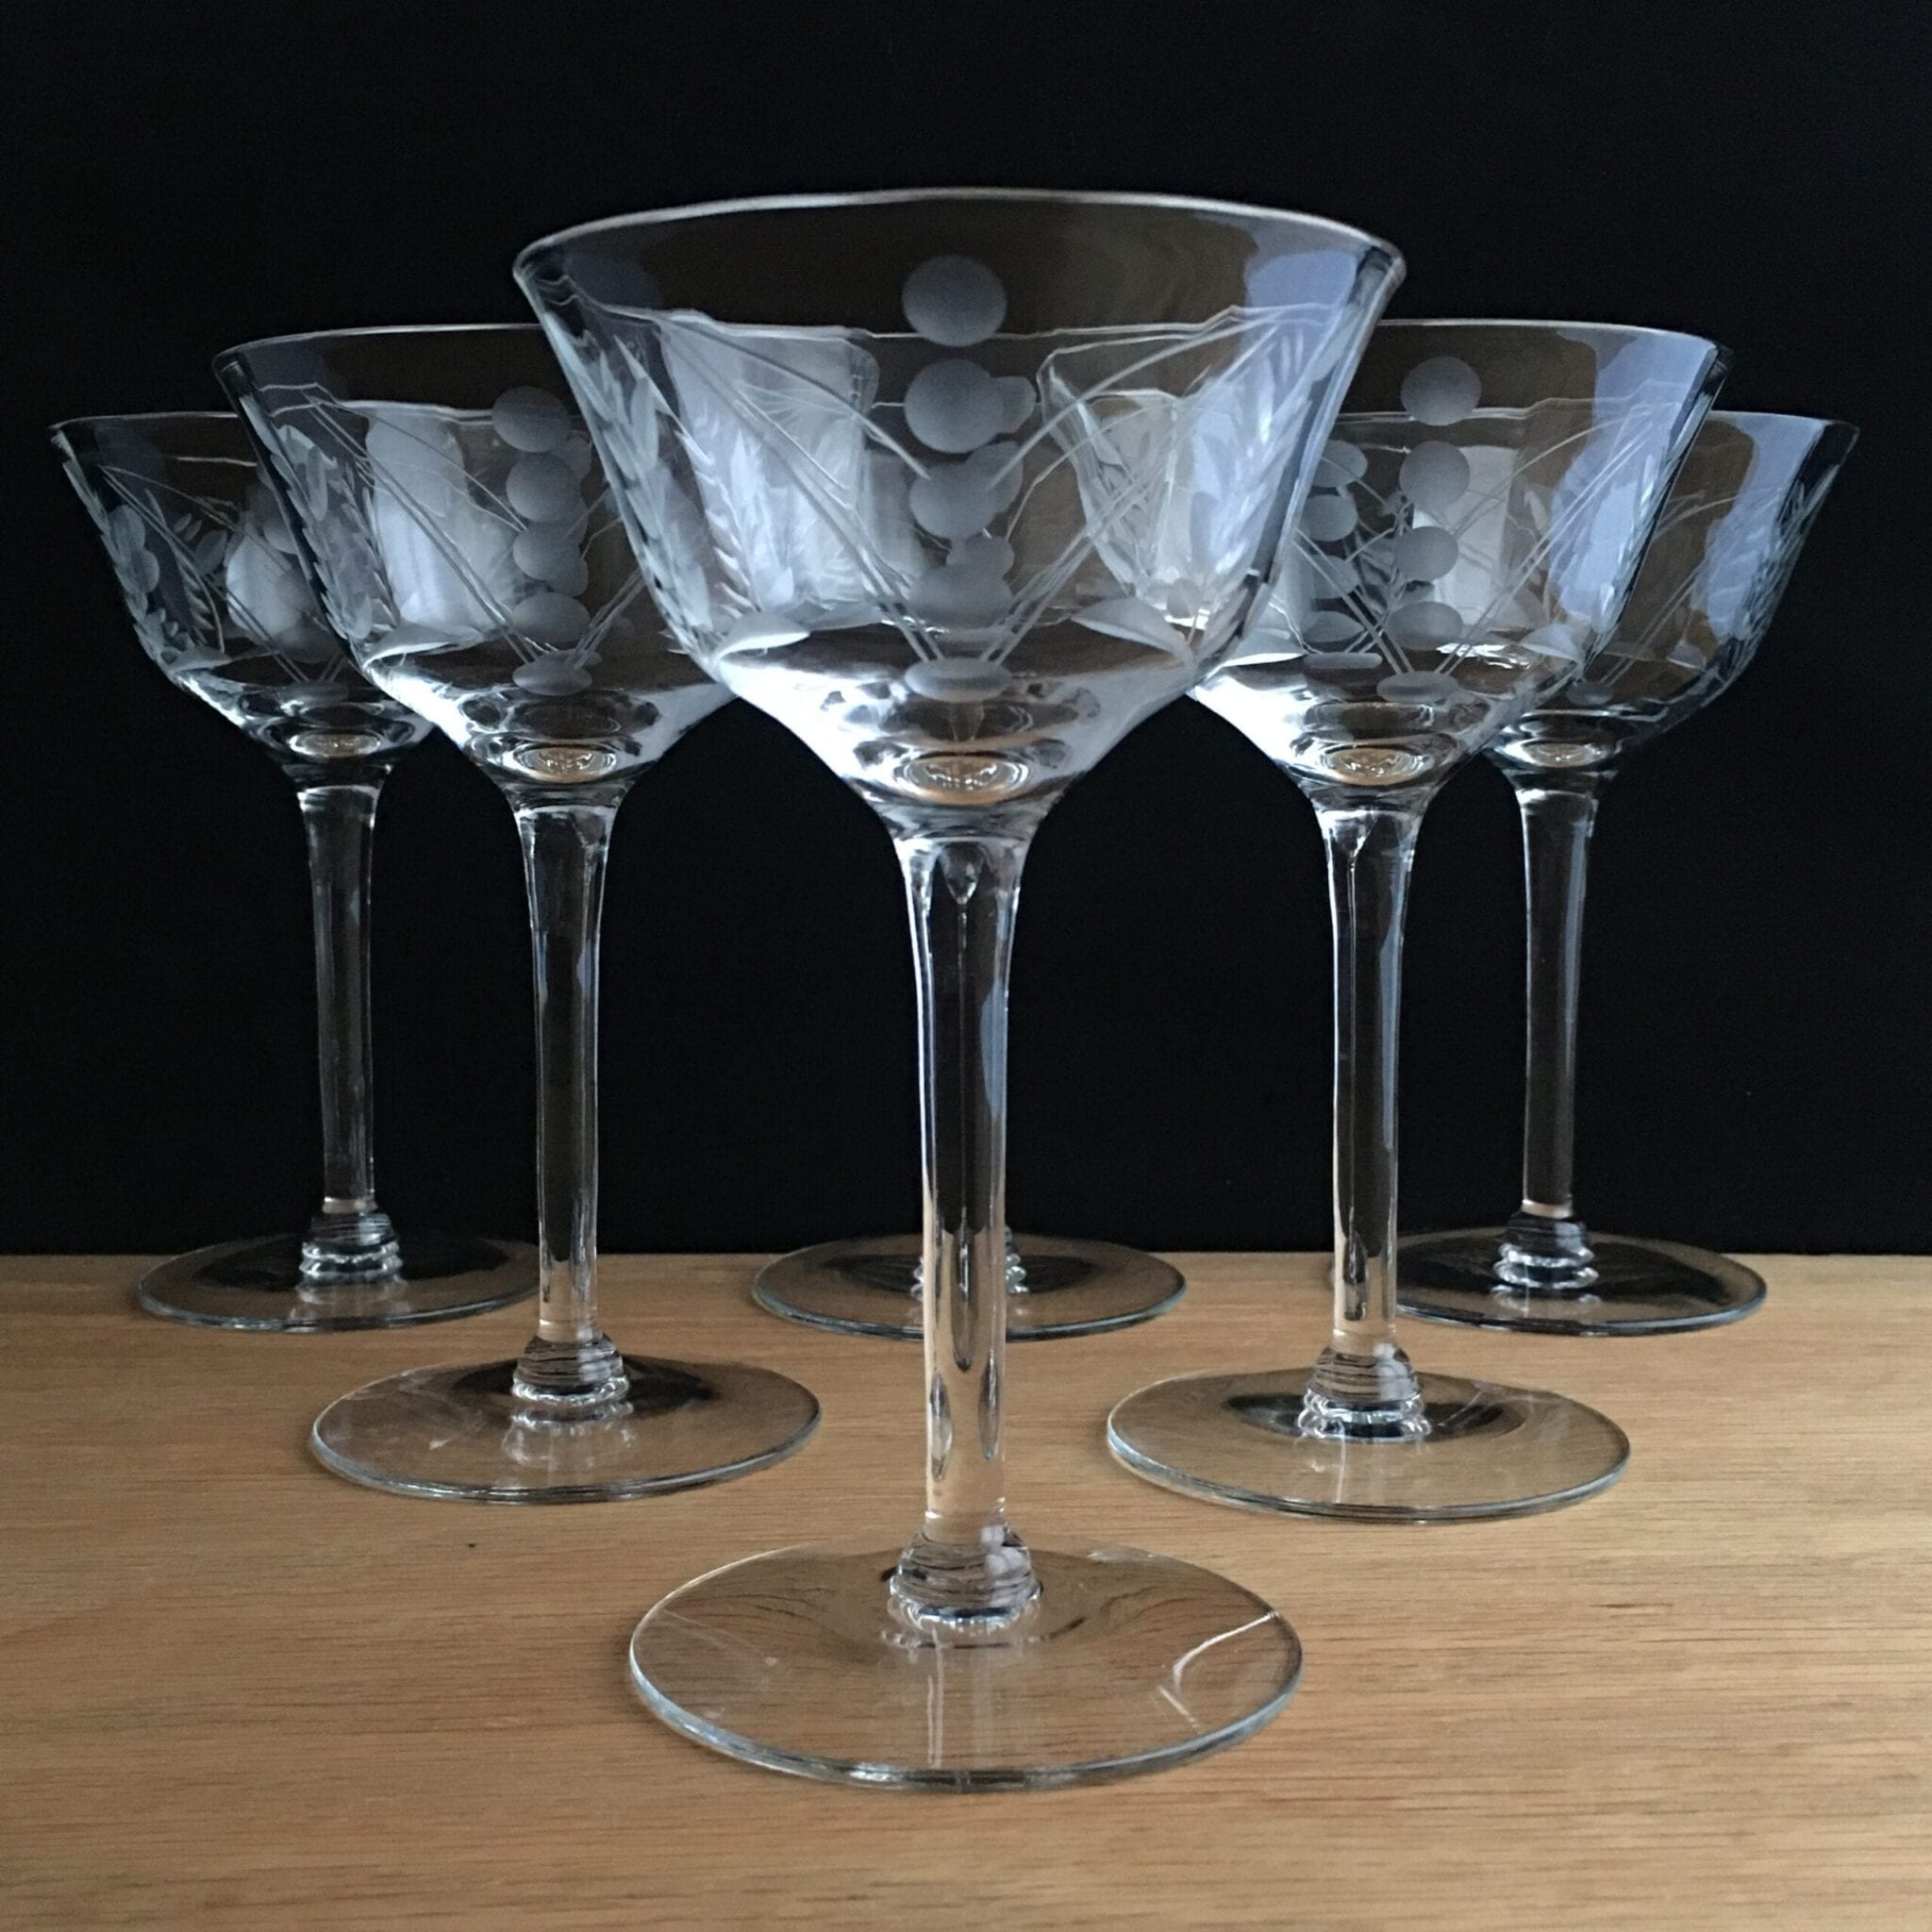 Art Deco Vintage Crystal Coupe Glasses Raising The Bar